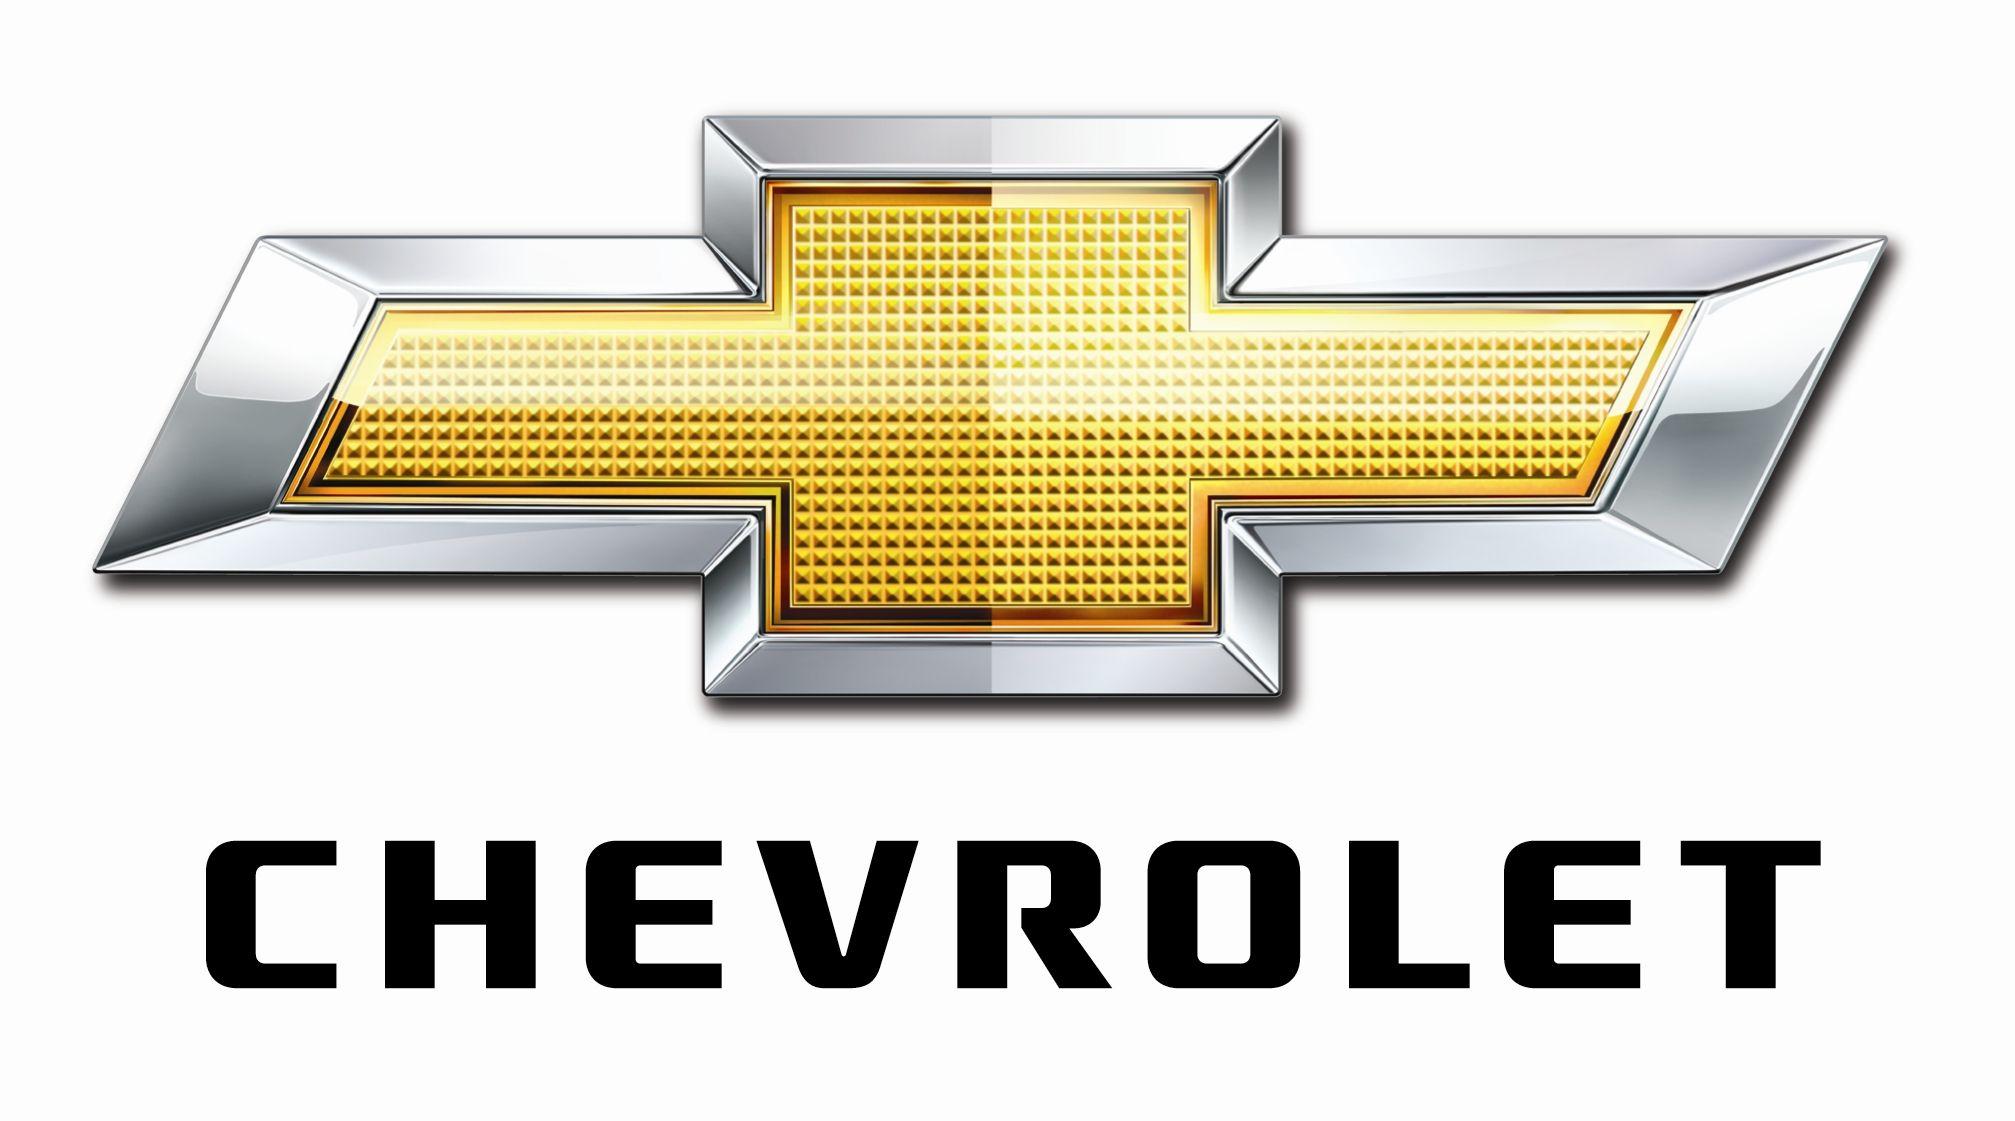 New Chevrolet Logo White Hd Wallpaper Just Another High Quality For Desktop Biler